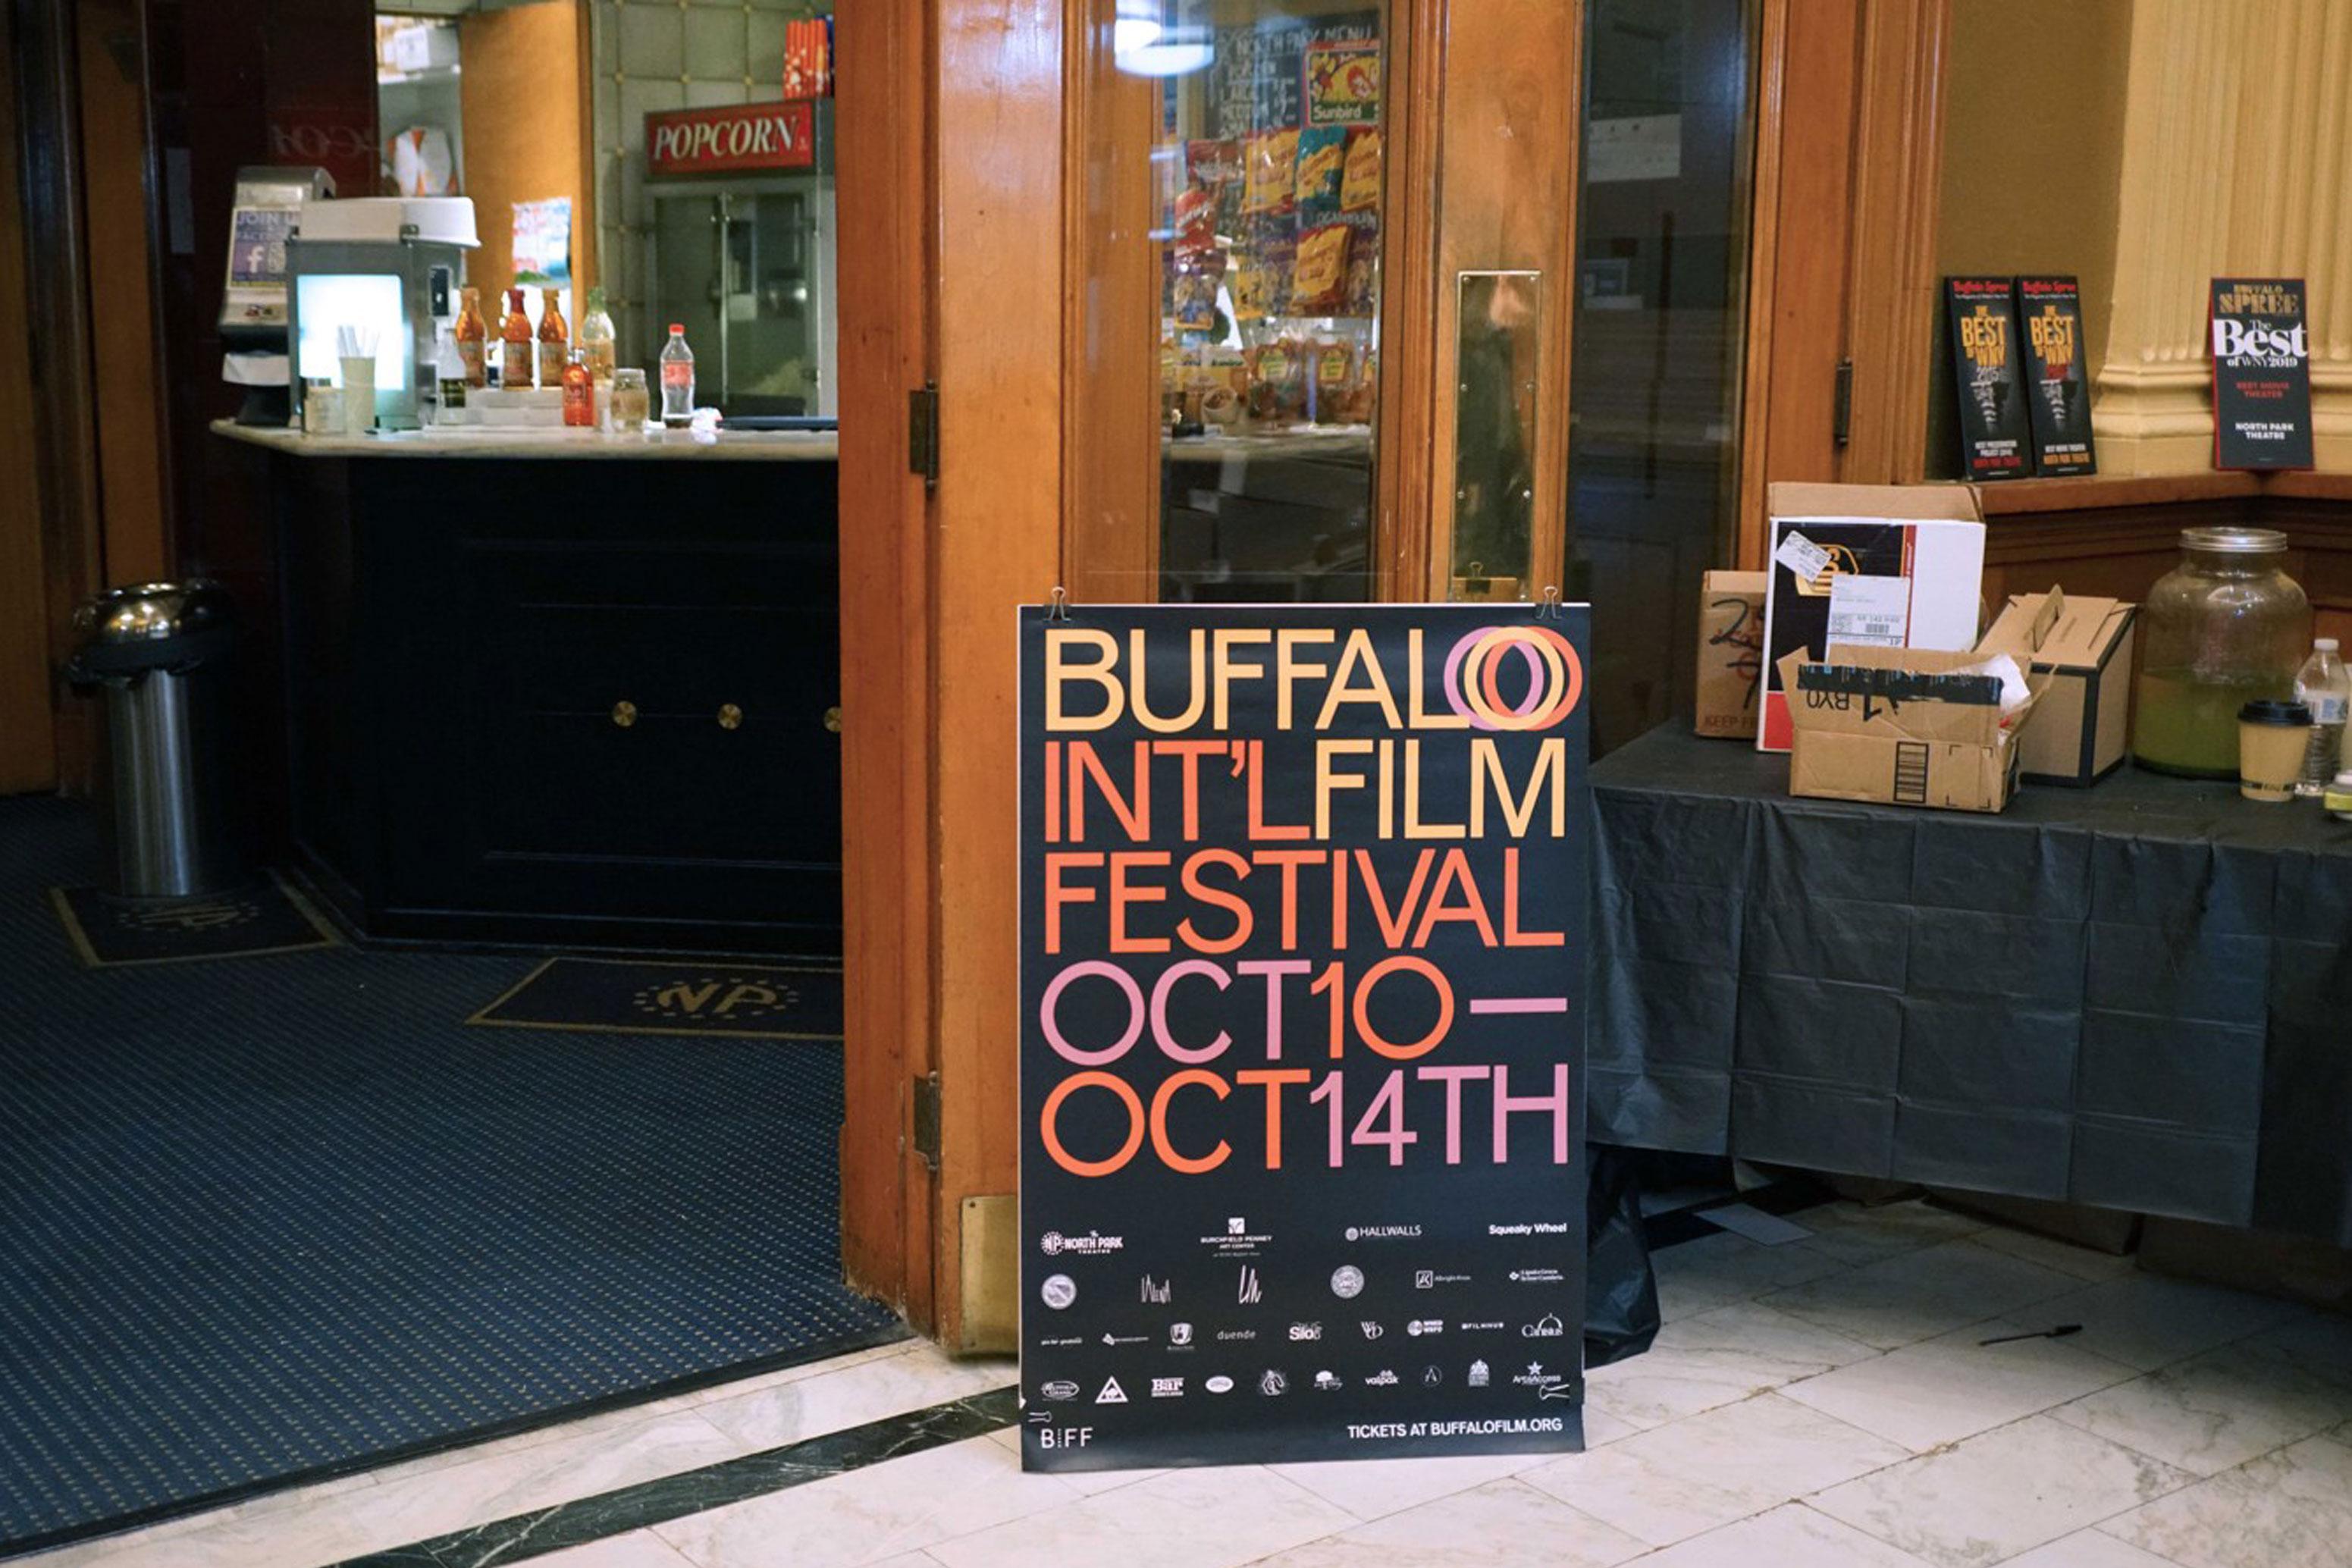 Buffalo International Film Festival Sign & Entrance